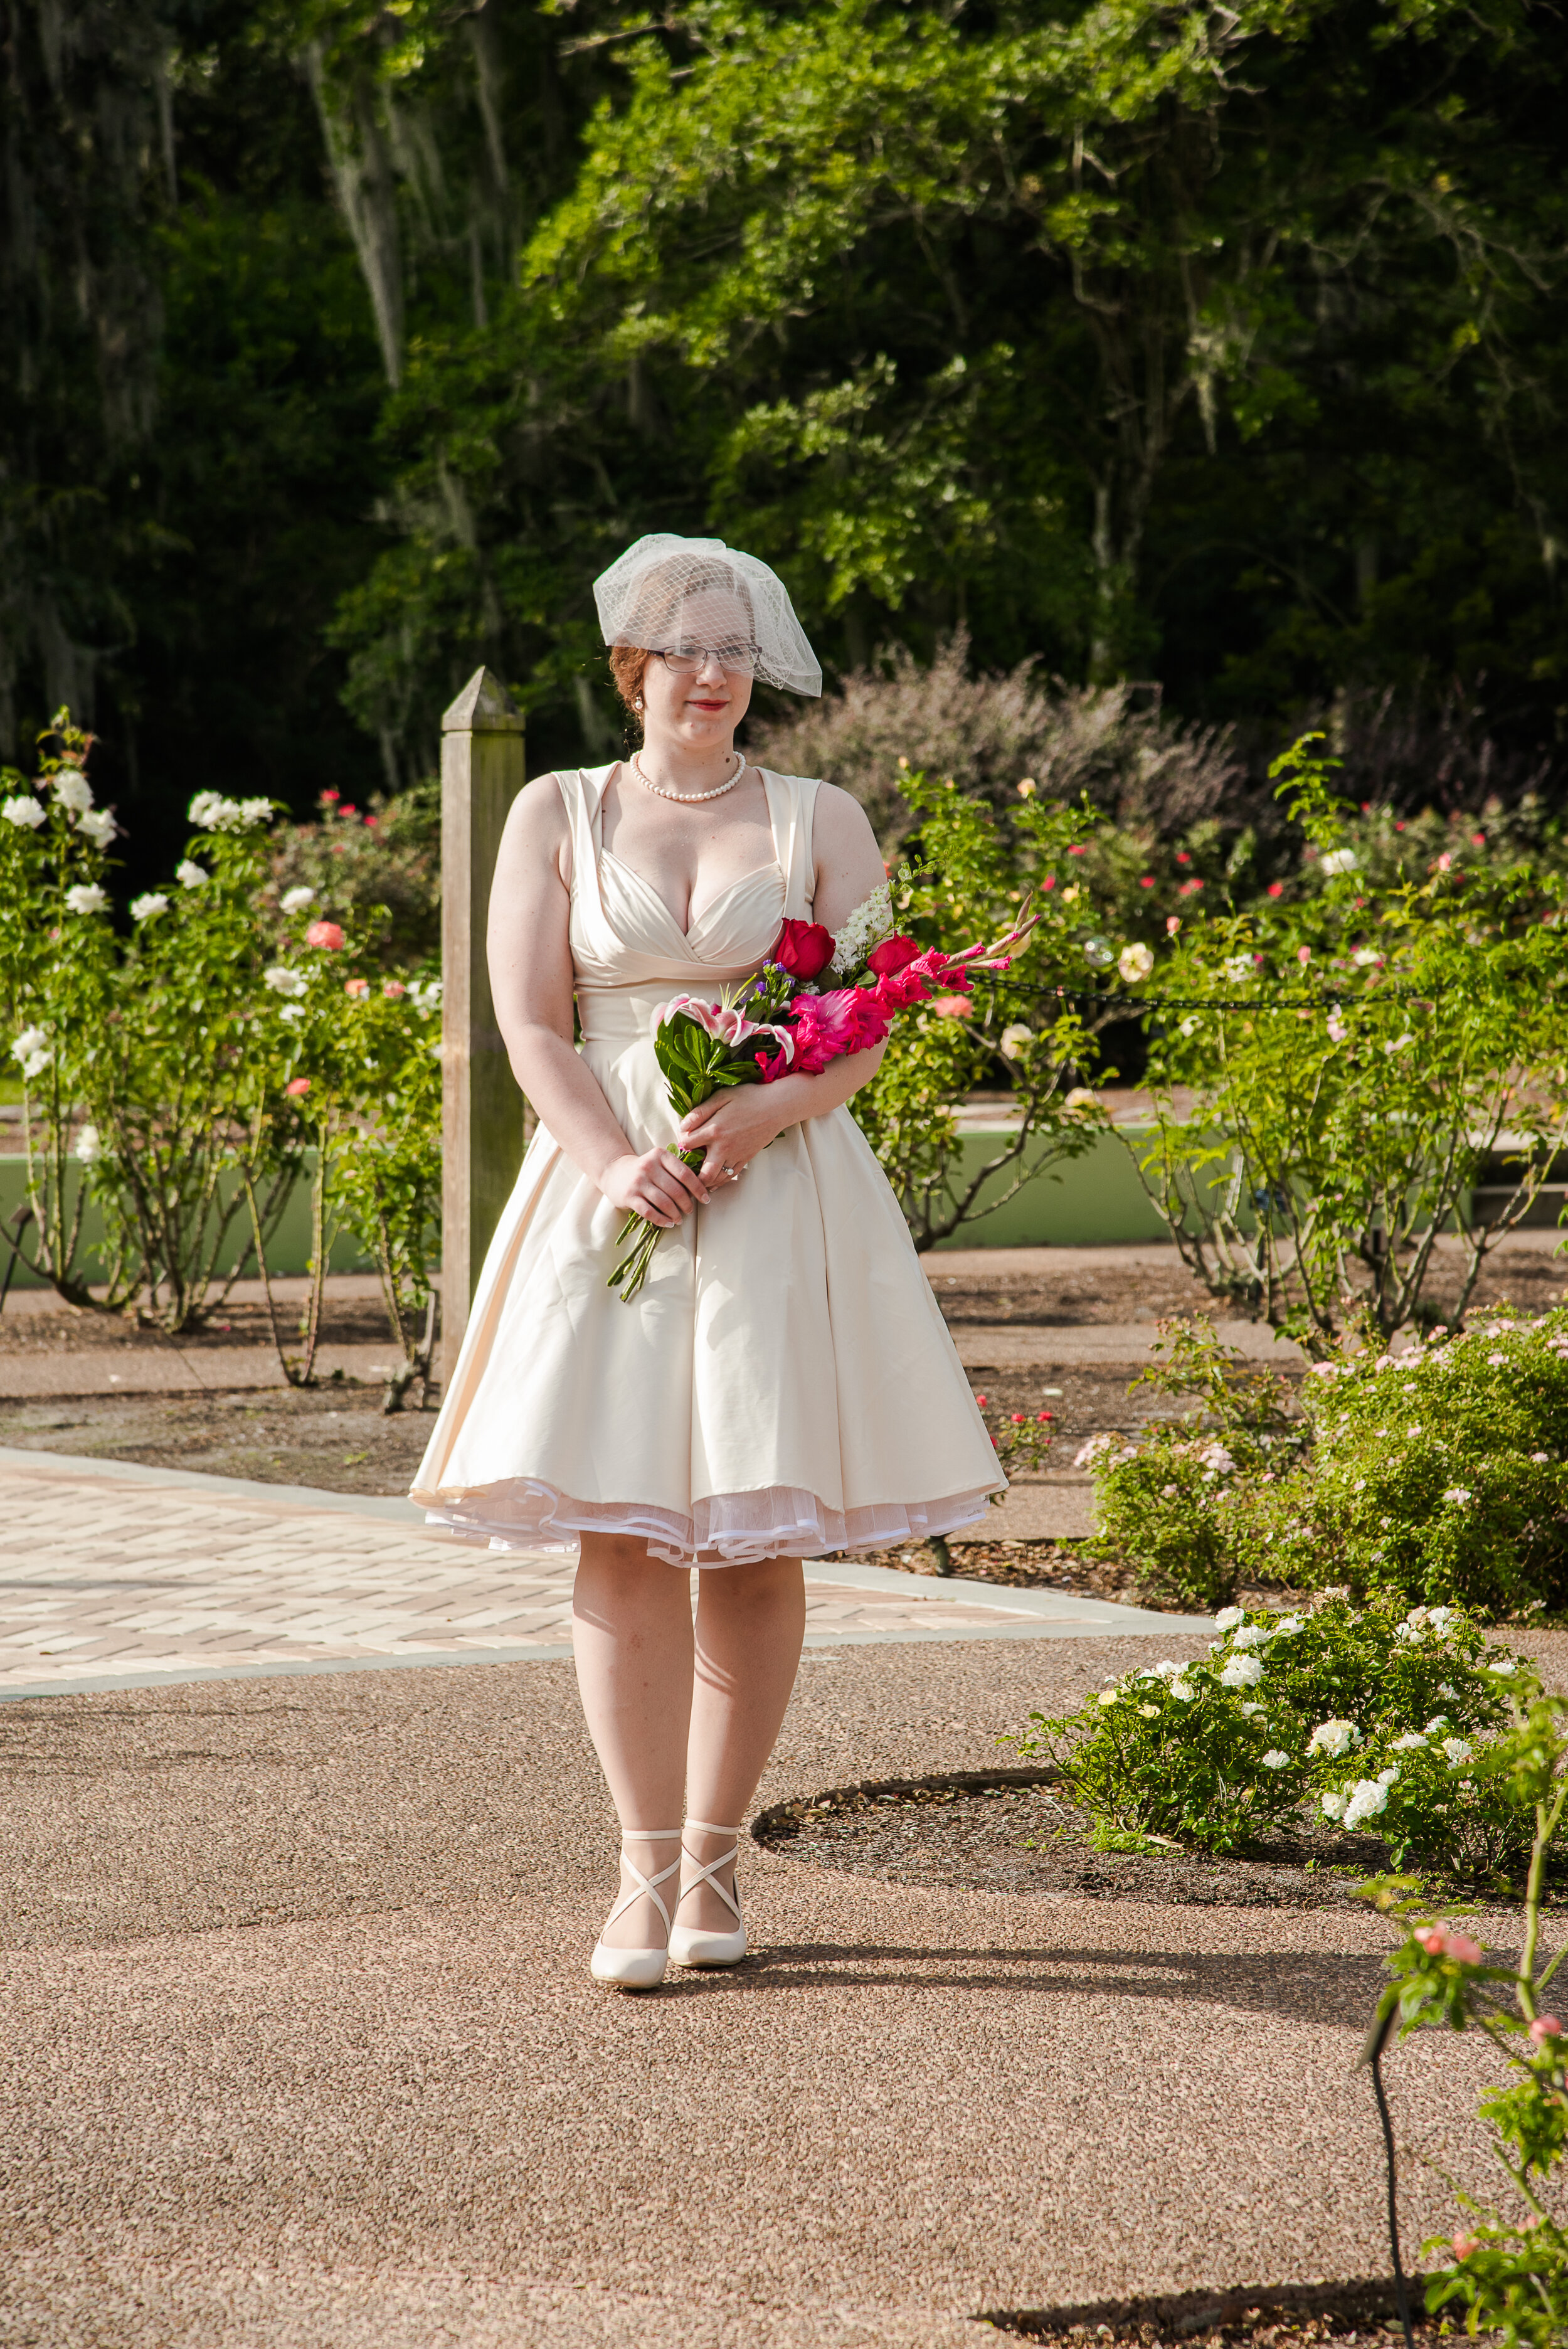 herry-garden-wedding-1-43.jpg